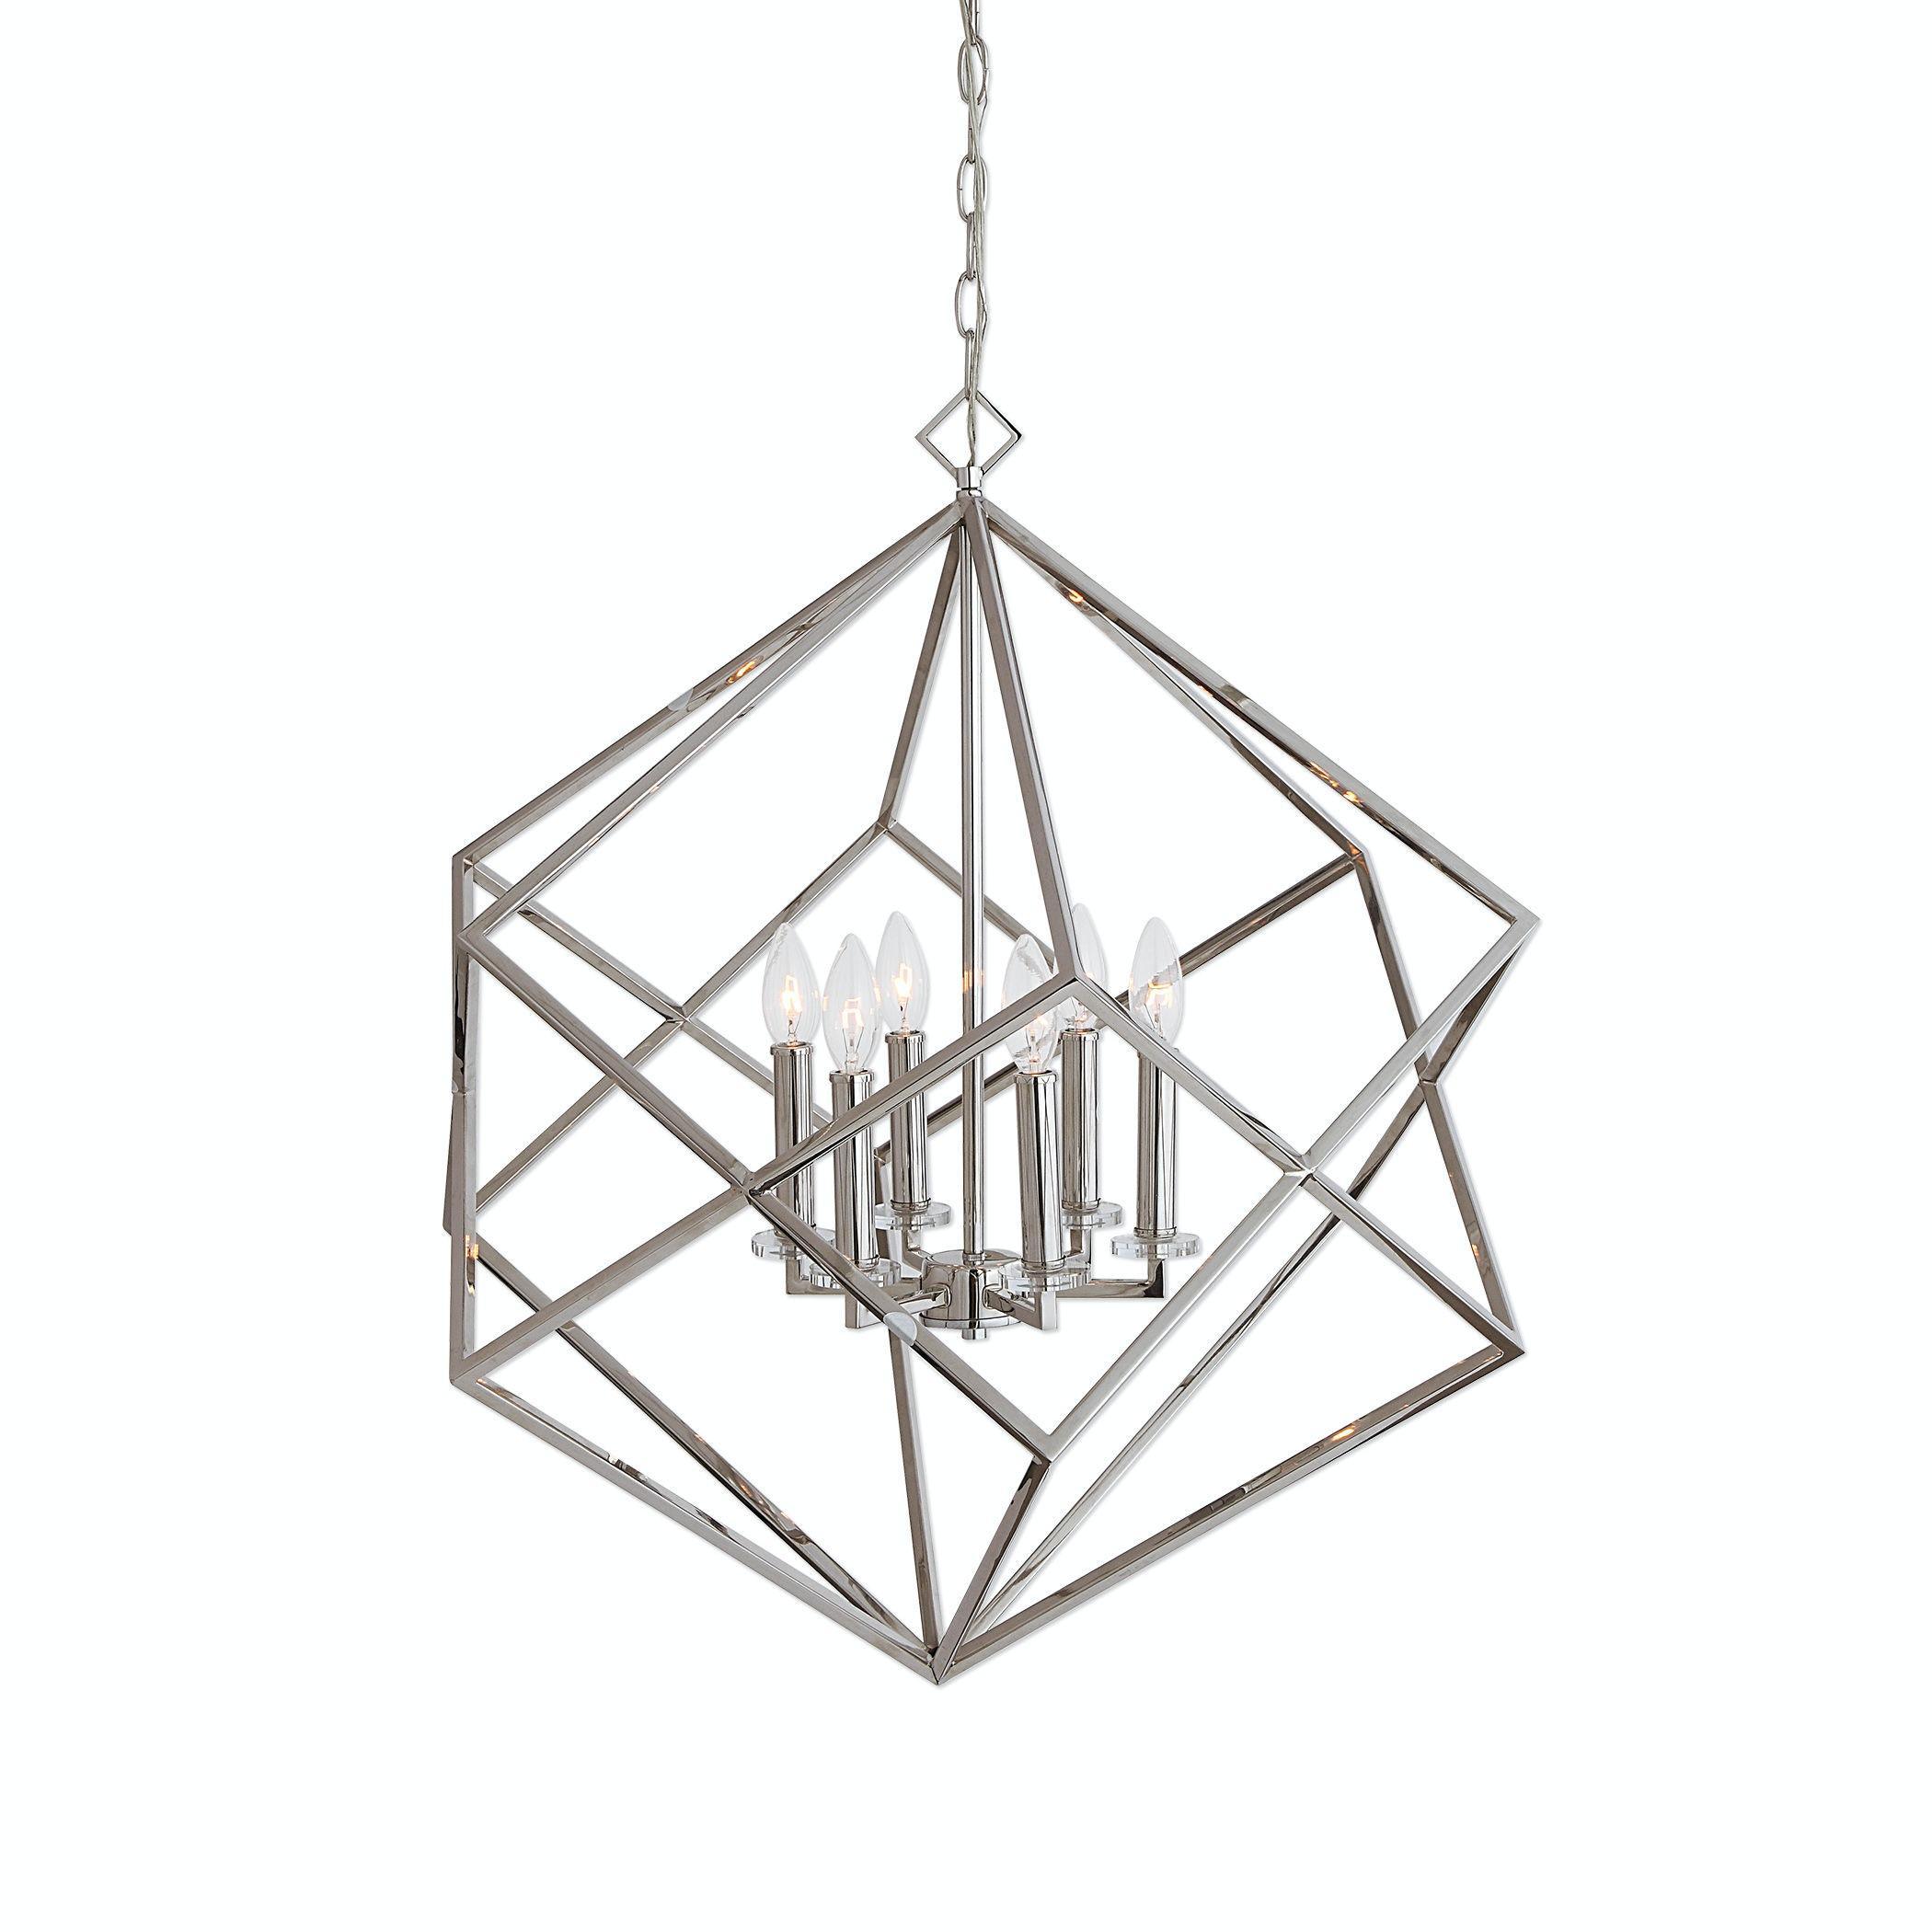 uttermost lighting pendant lighting fixtures uttermost euclid light nickel cube pendant 22122 lamps and lighting